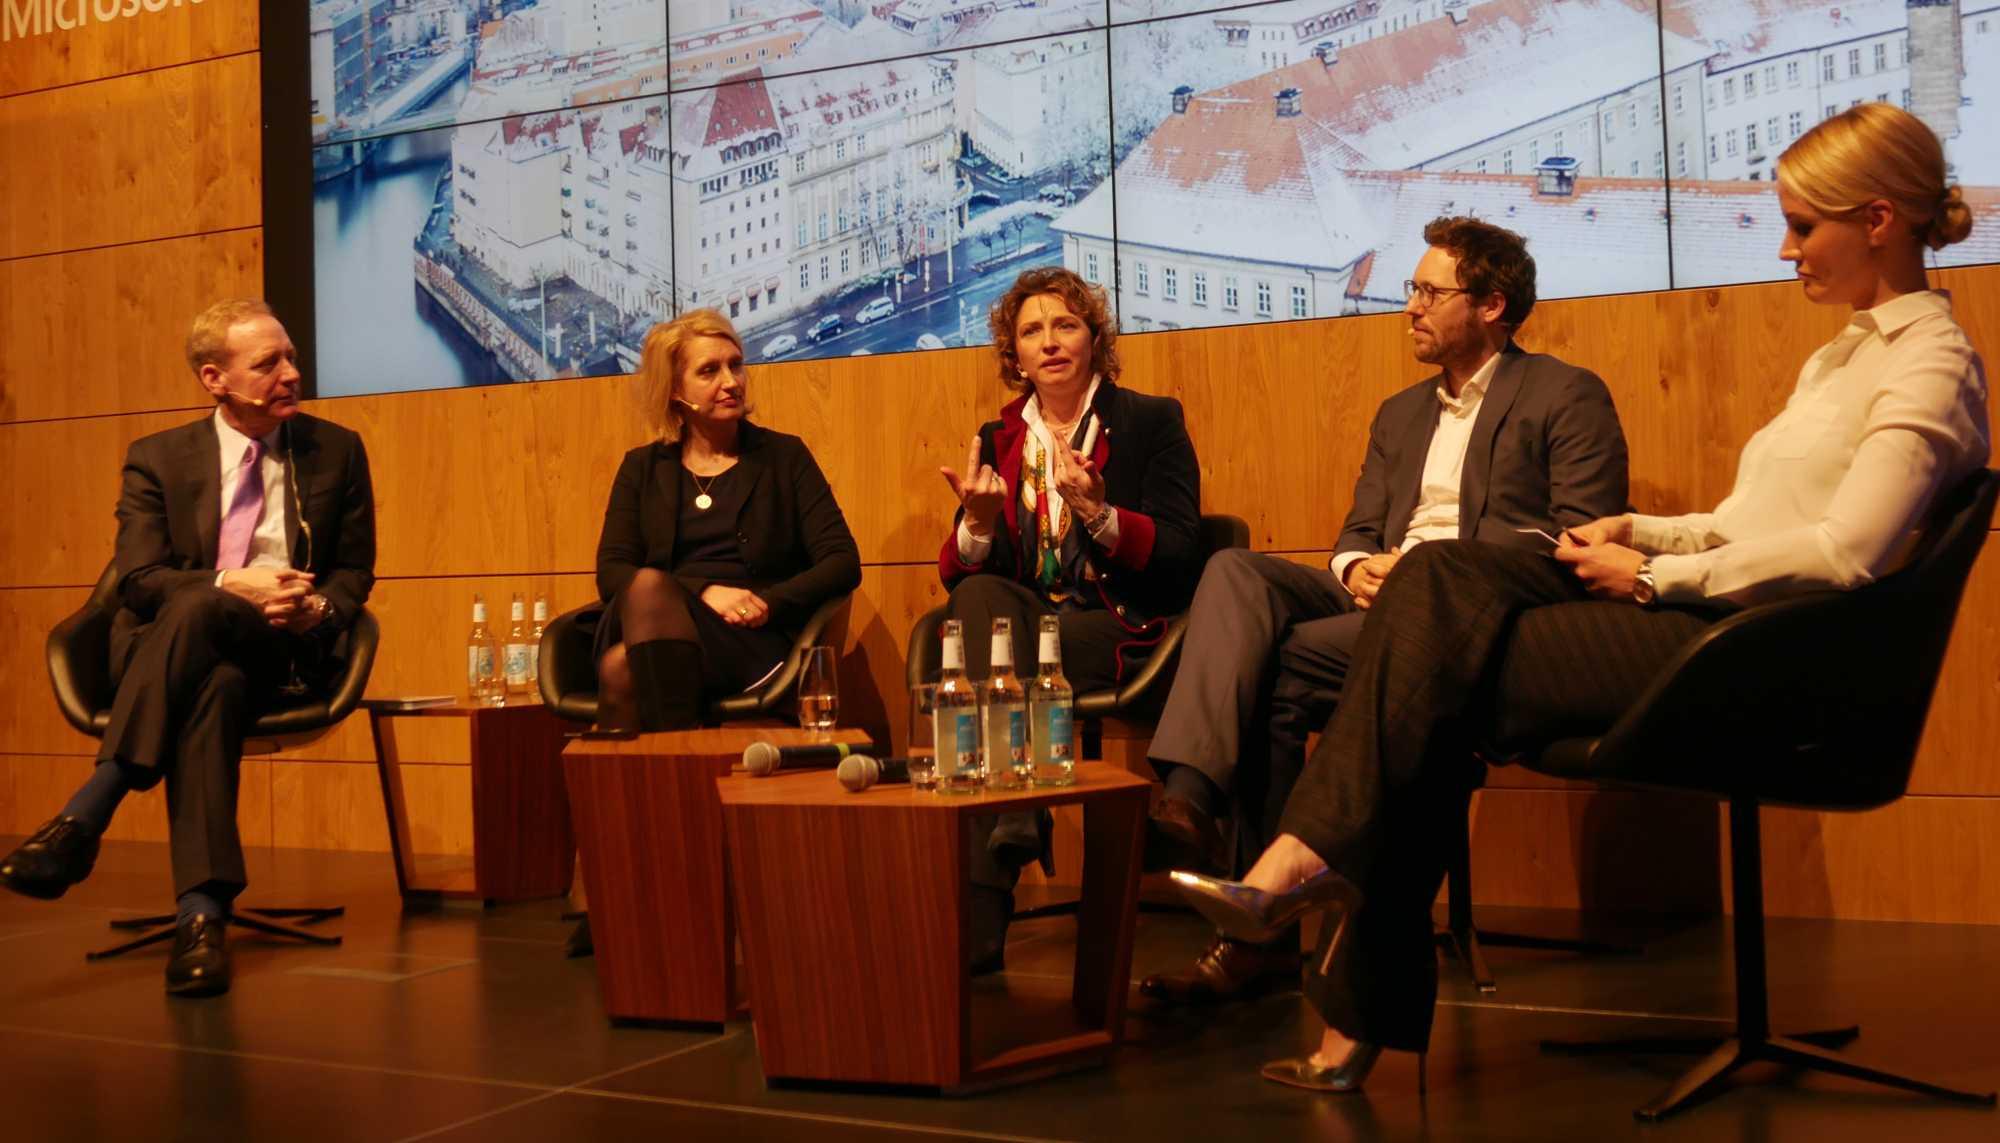 v.l.n.r: Brad Smith (Microsoft), Irdis Plöger (BDI), Nicola Beer (FDP), Jan Philipp Albrecht (MdEP, Die Grünen), Moderatorin Judith Rakers